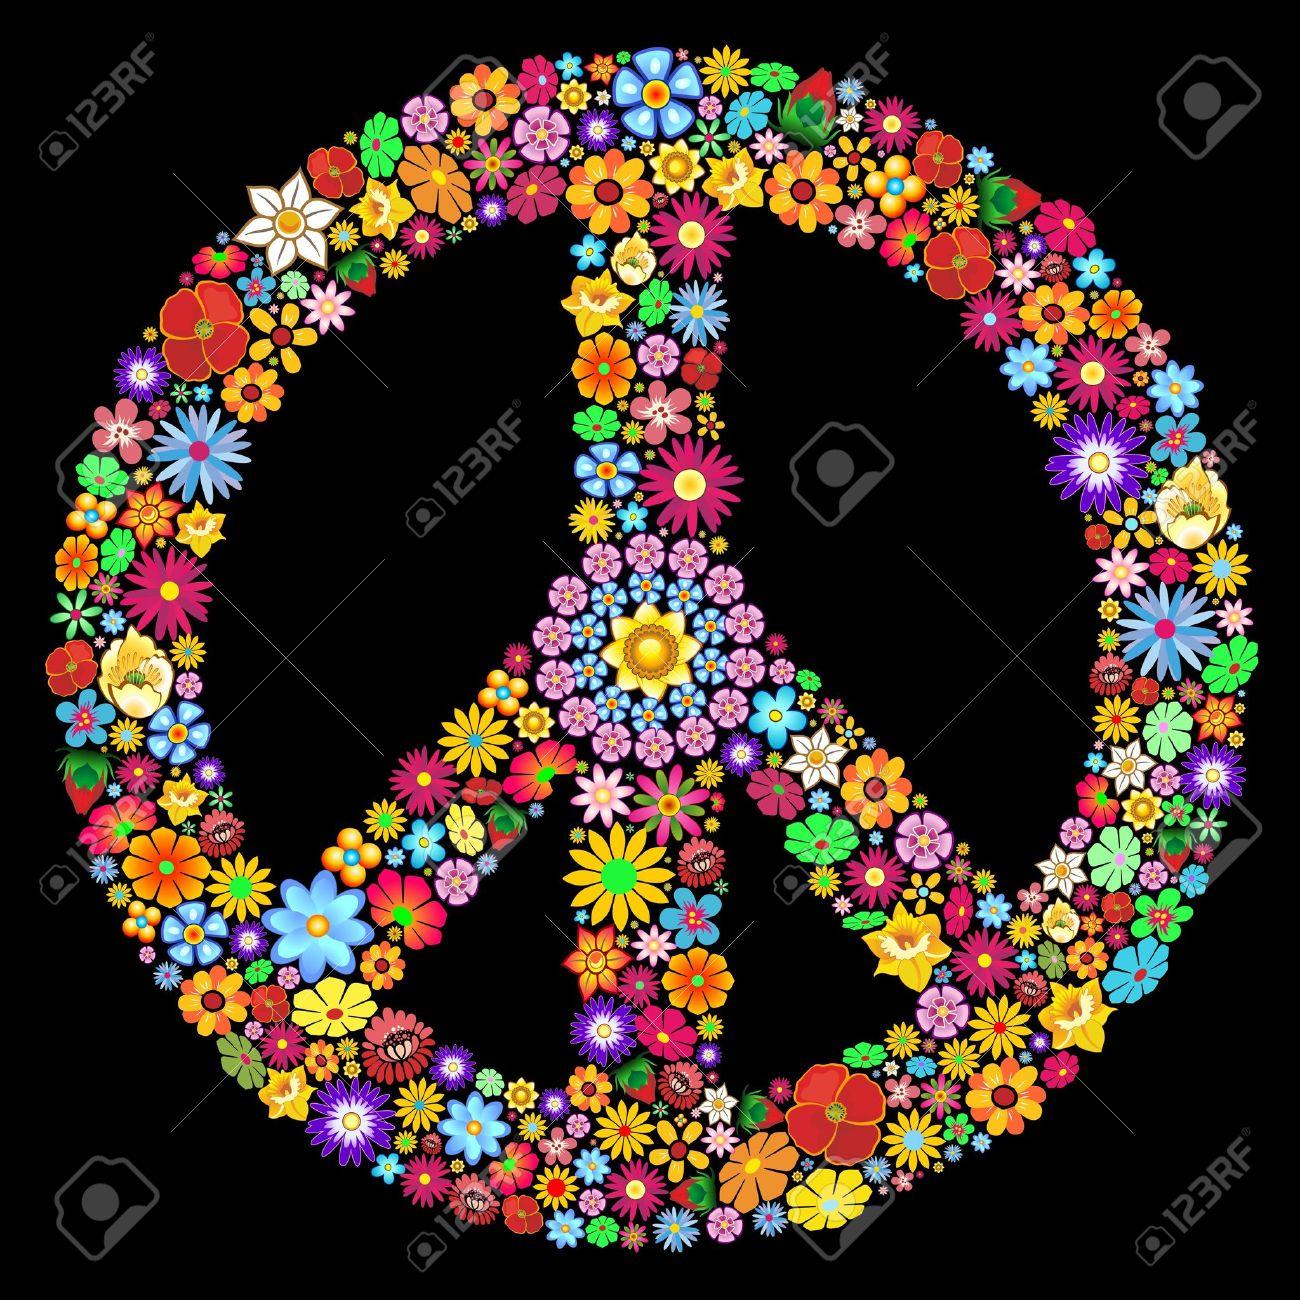 Peace Symbol Groovy Flowers Art Design Stock Vector - 19317037